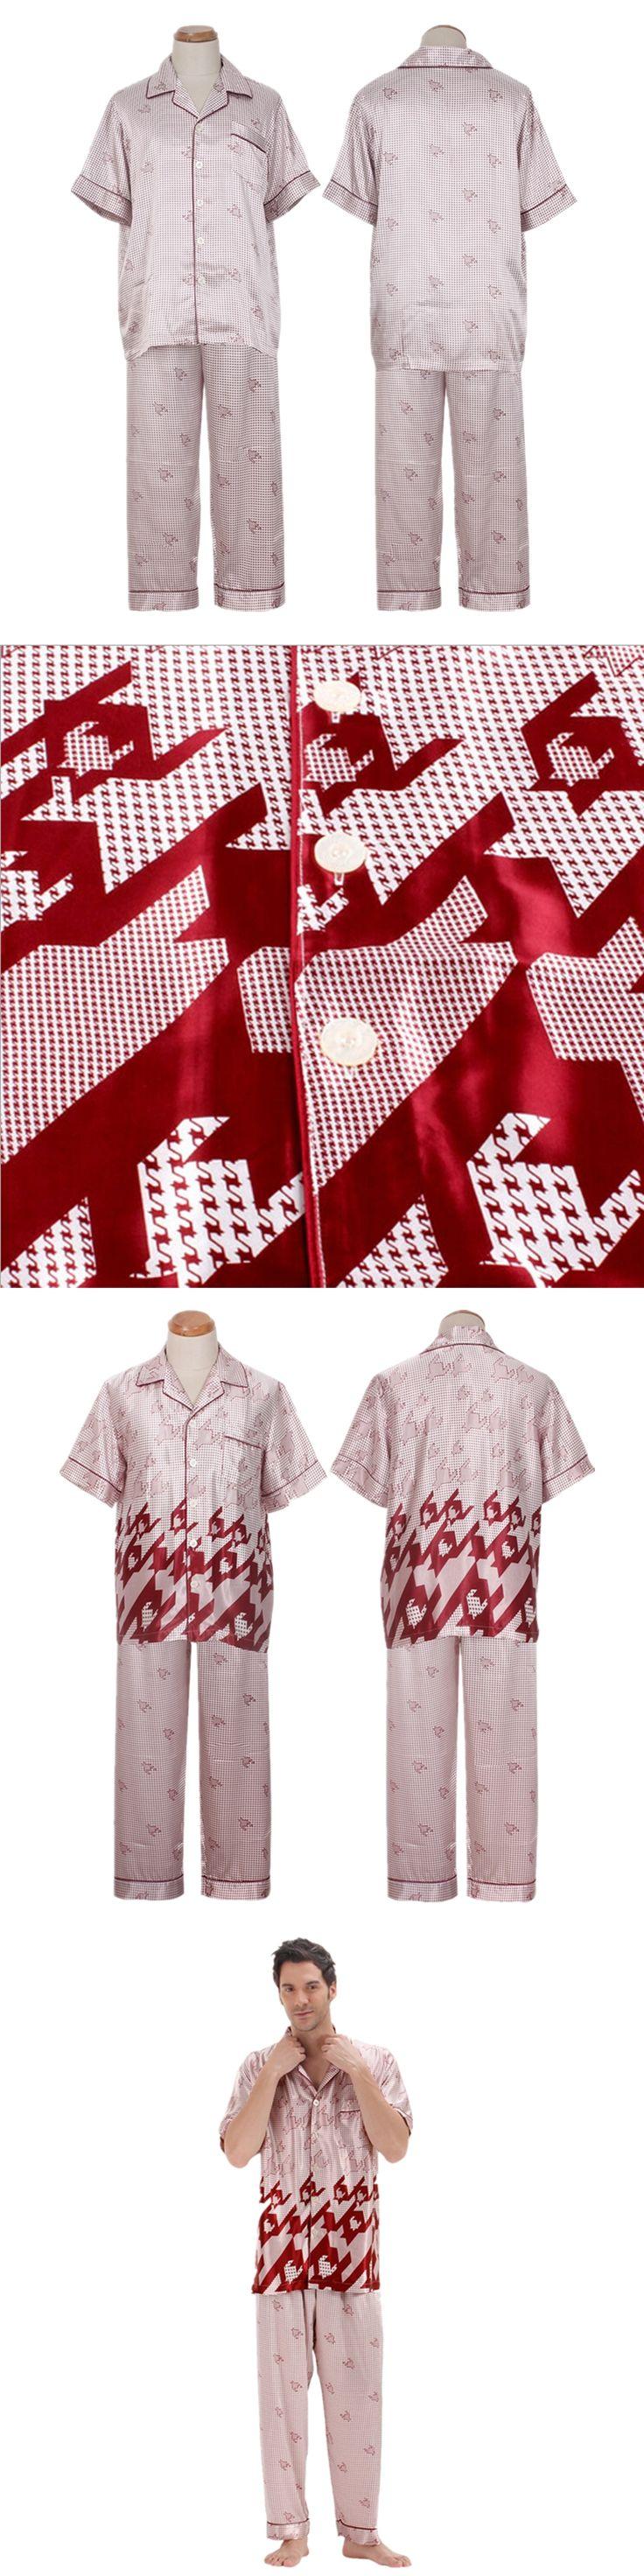 Luxury Short Sleeved Silk Satin Pajamas for Men Sleepwear Summer Pajama Pyjamas PJS Sleepwear Sleepcoat Set